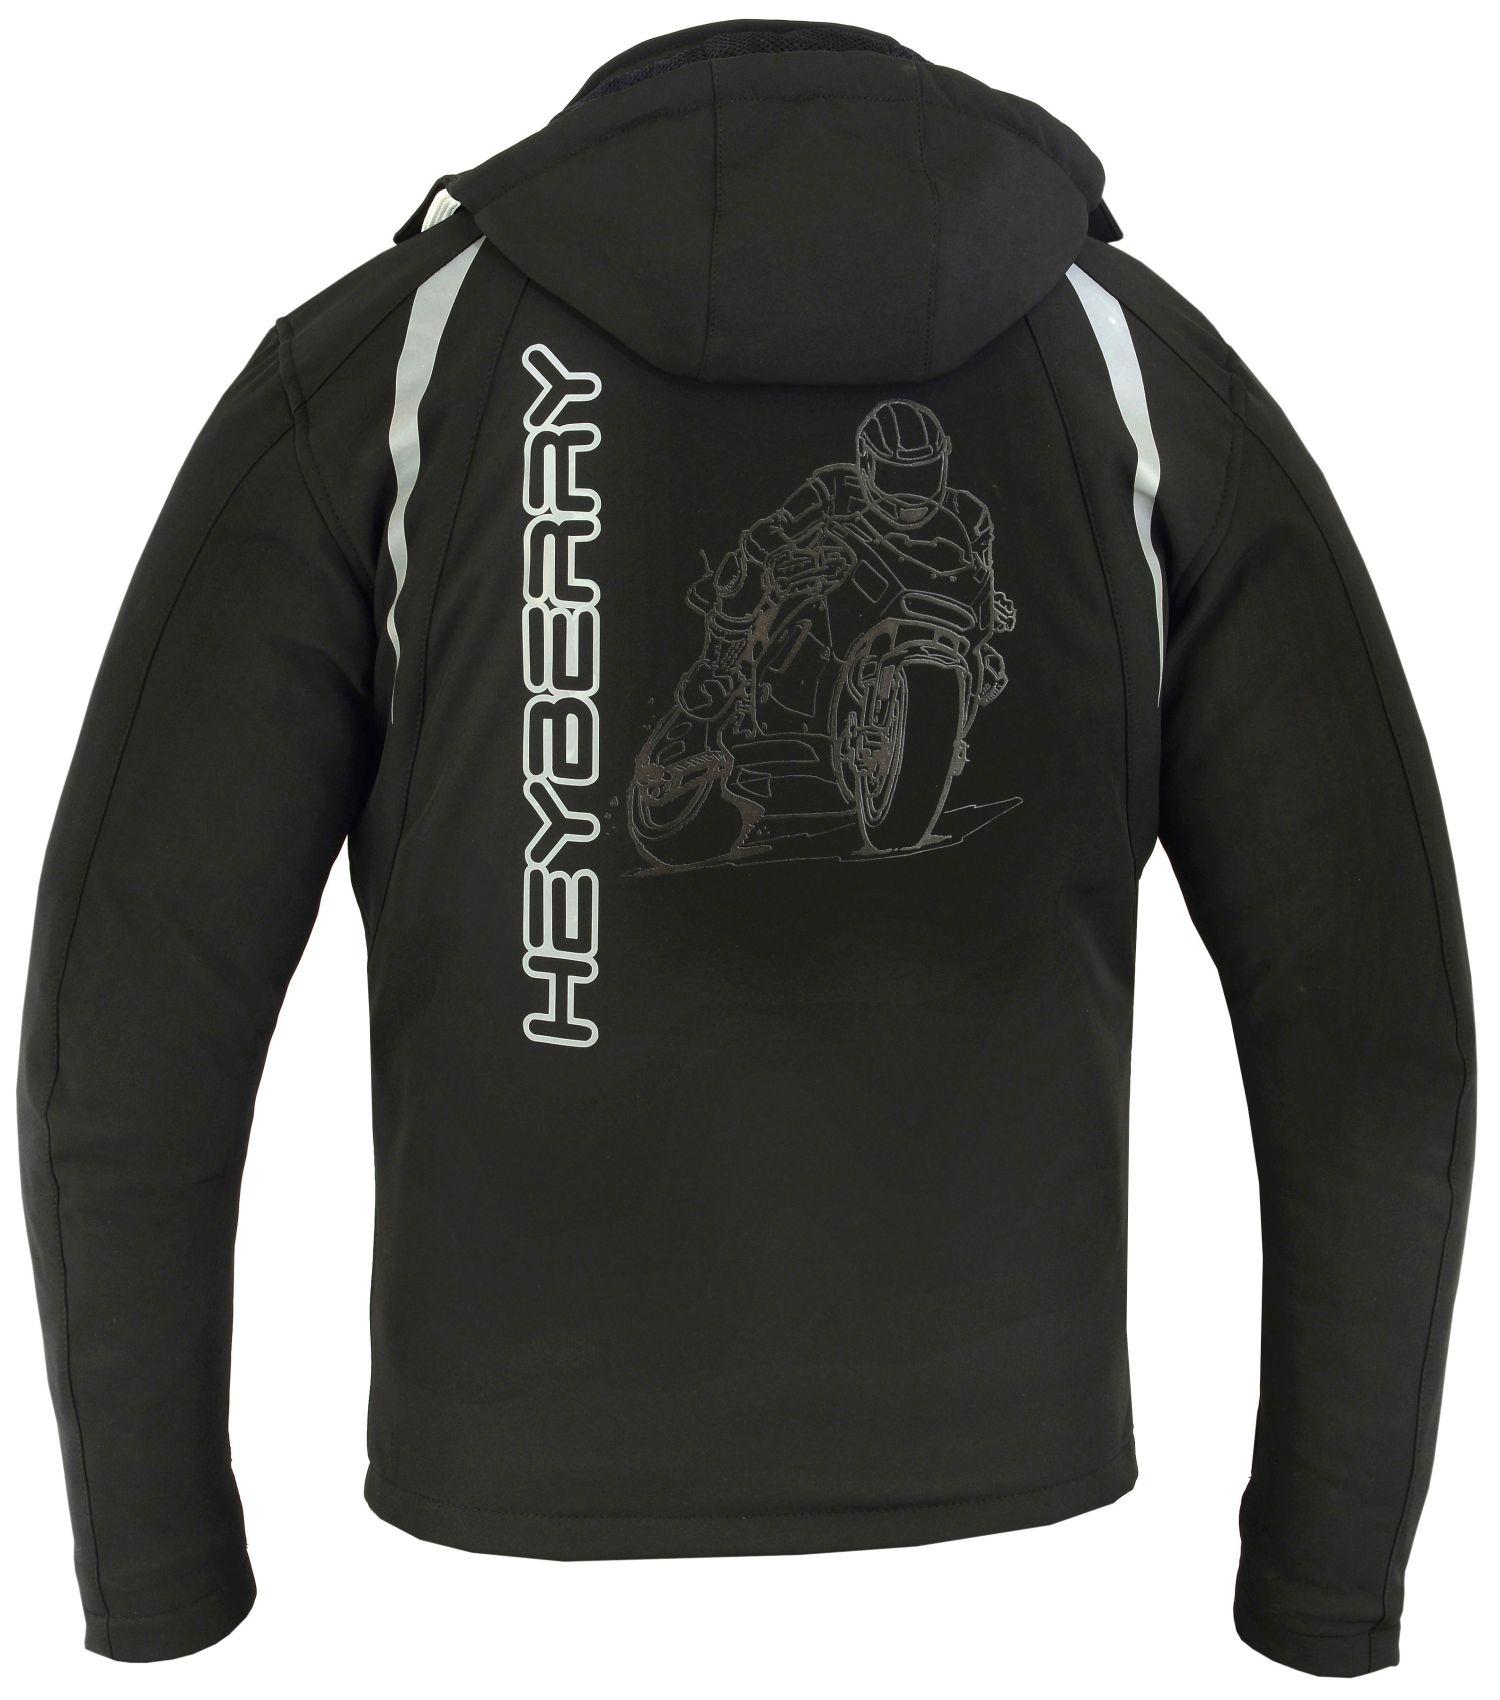 Details zu Heyberry Softshell Motorradjacke Motorrad Softshelljacke Gr. M bis 3XL